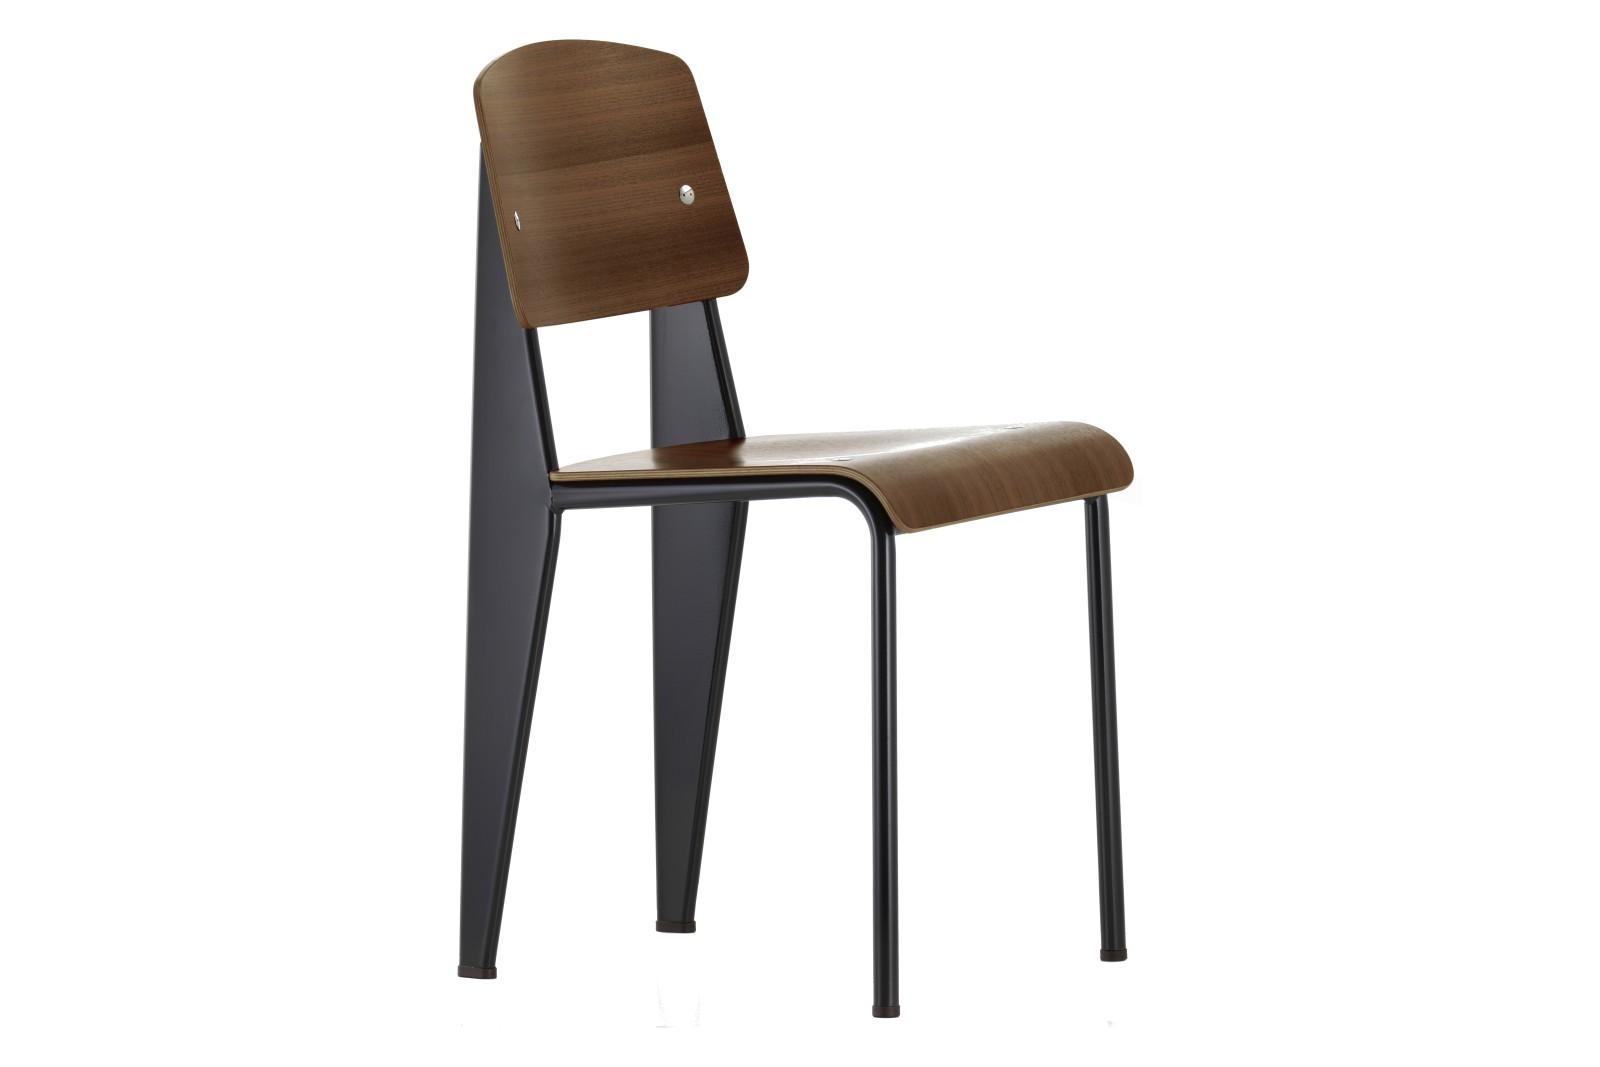 Standard Dining Chair 45 walnut black pigmented, 05 felt glides for hard floor, 12 Deep Black powder